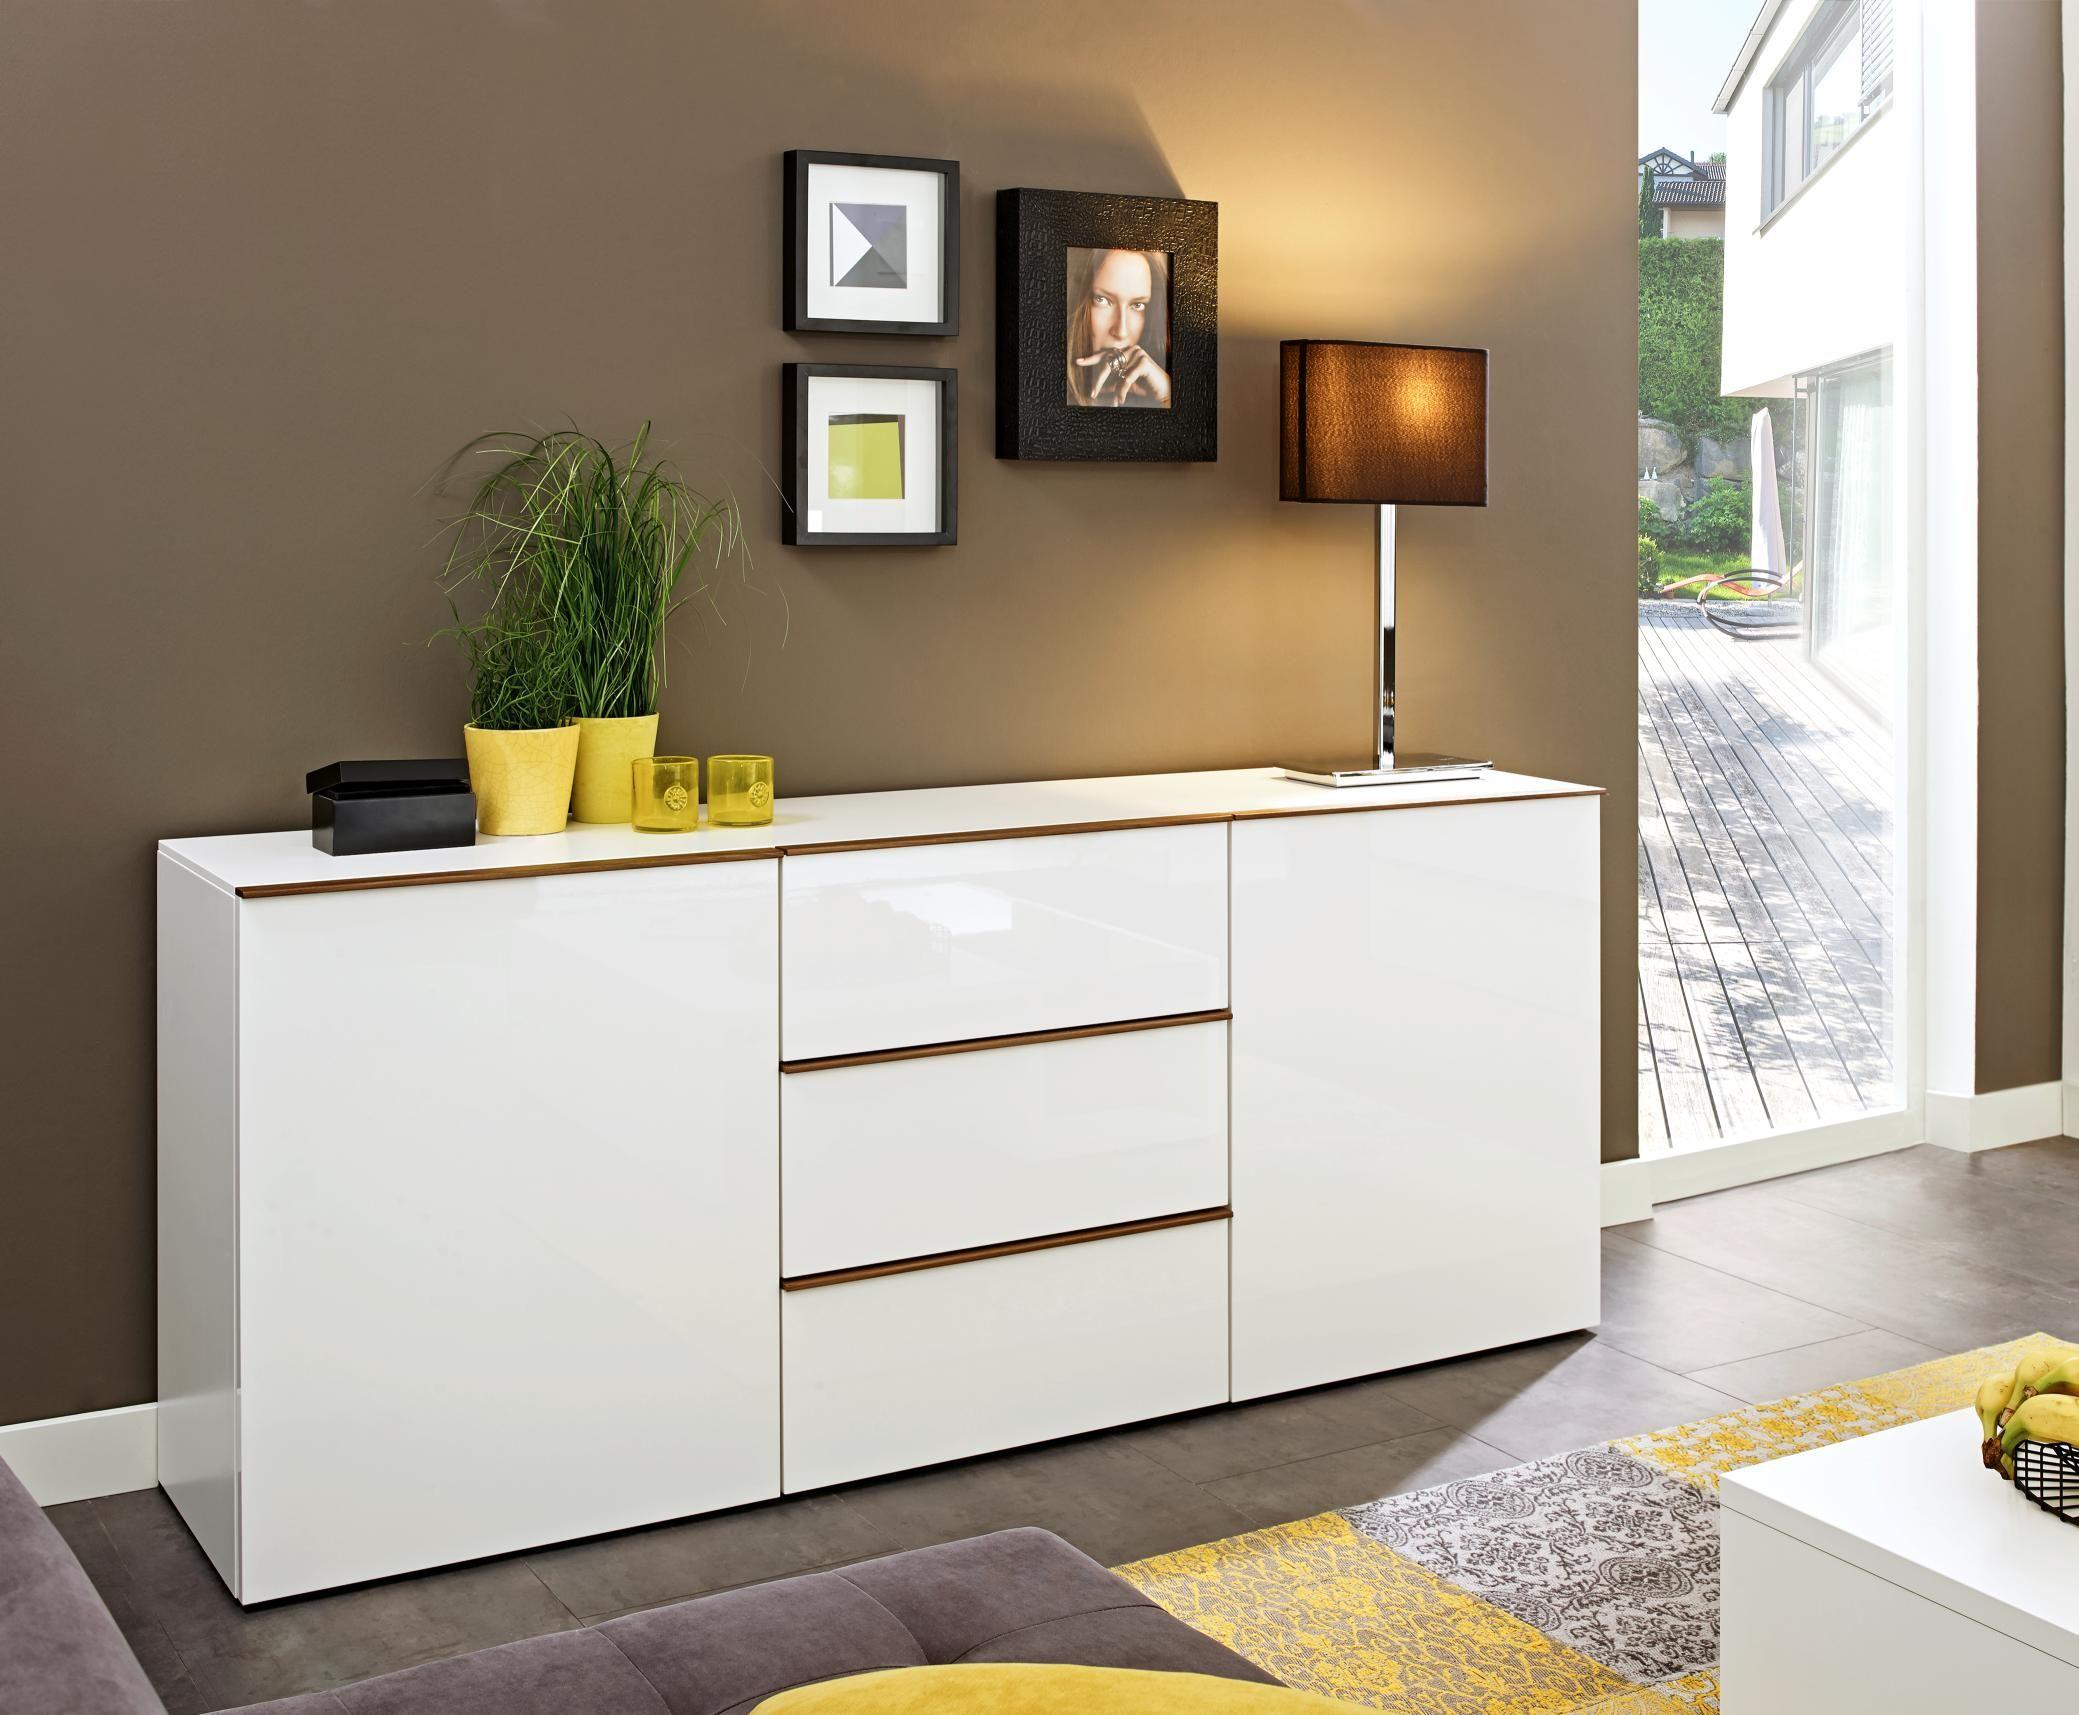 Sideboard In Weiss Von Dieter Knoll Furniture Home Decor Home